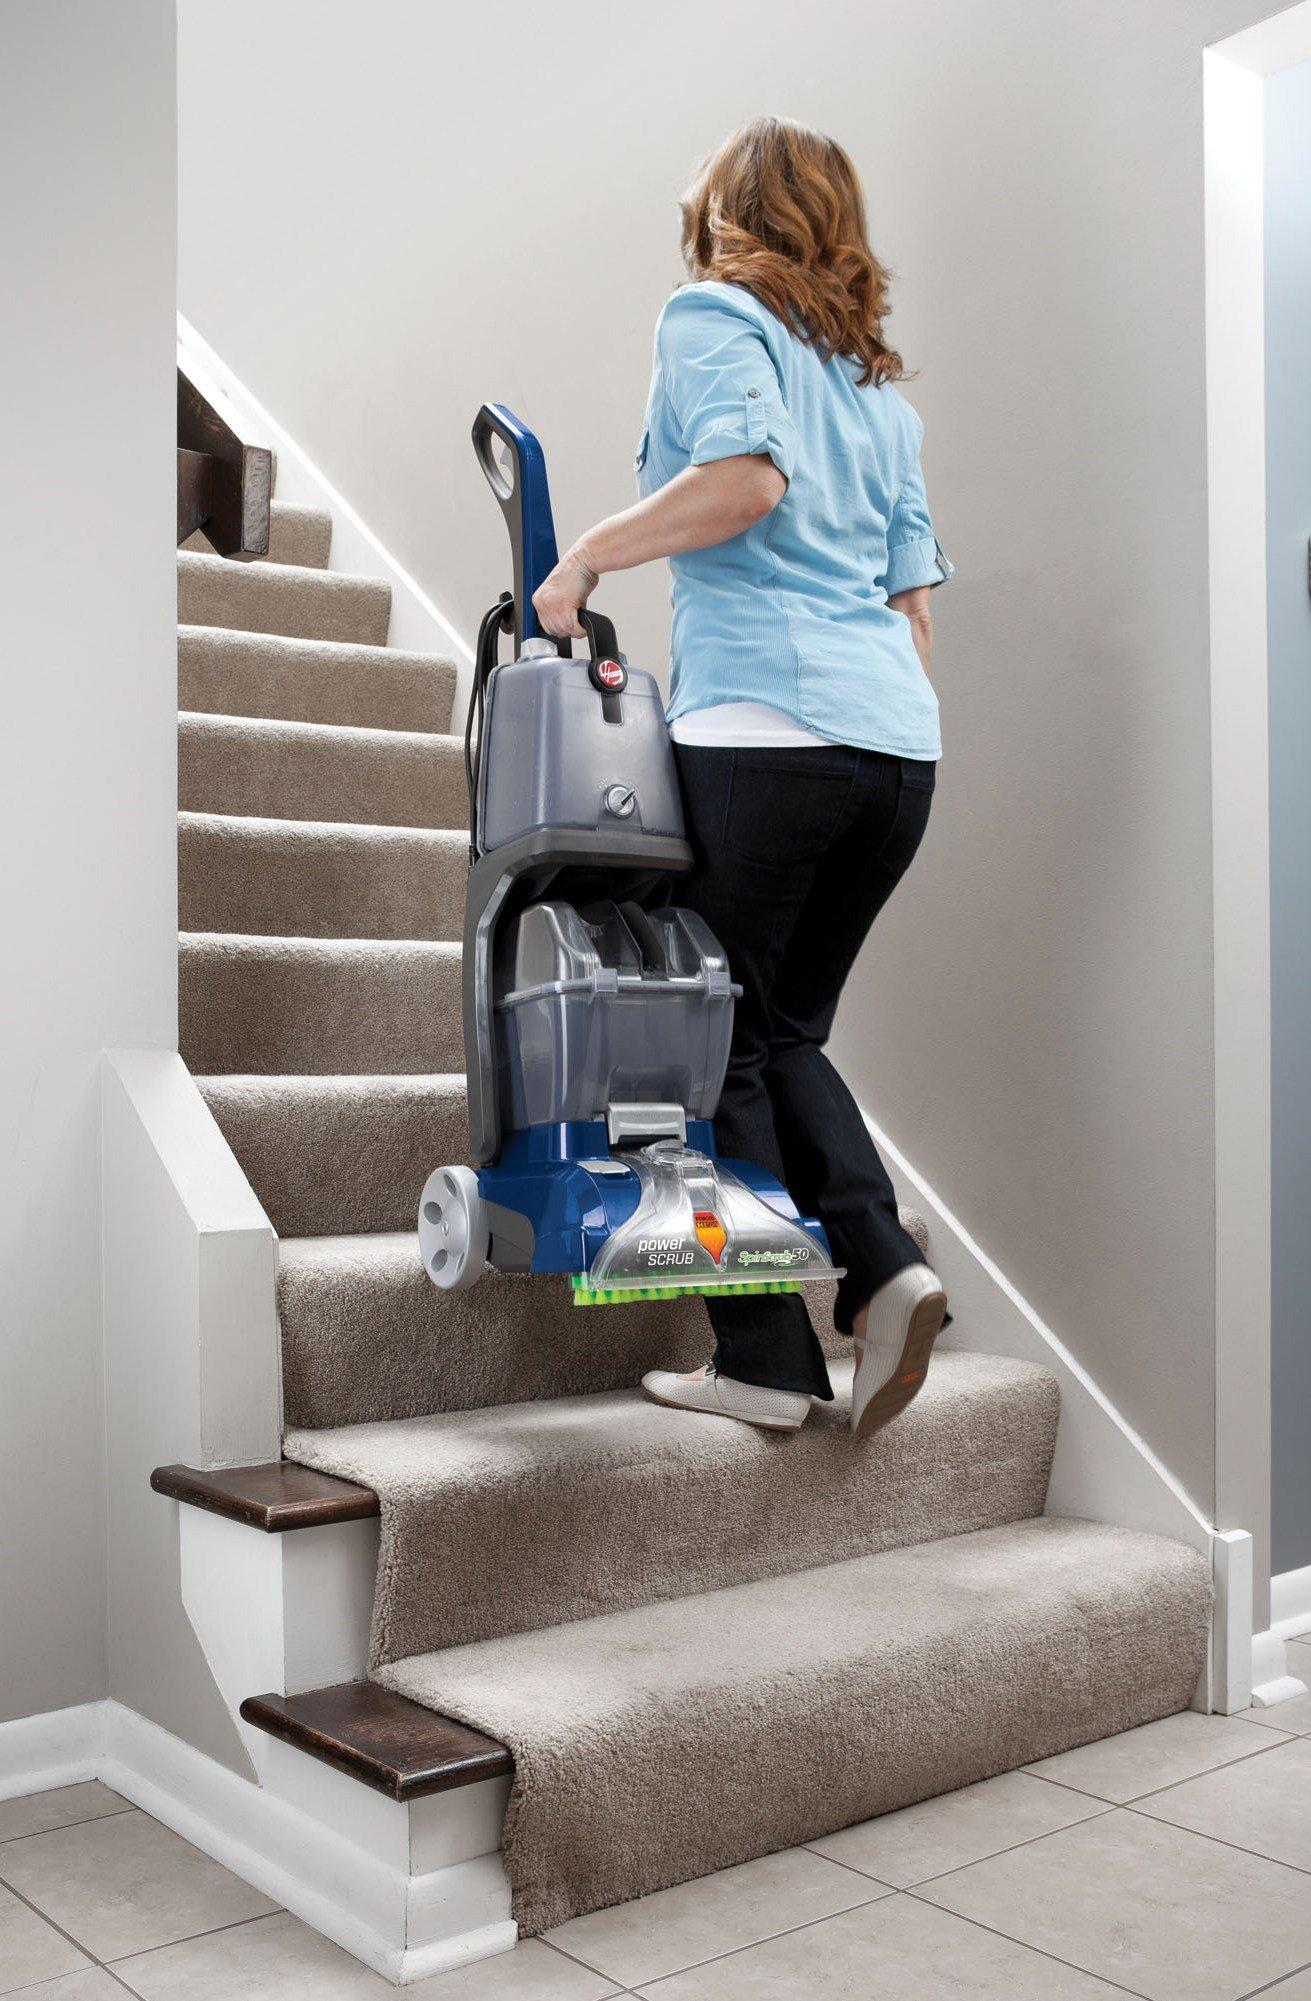 Power Scrub Carpet Cleaner4